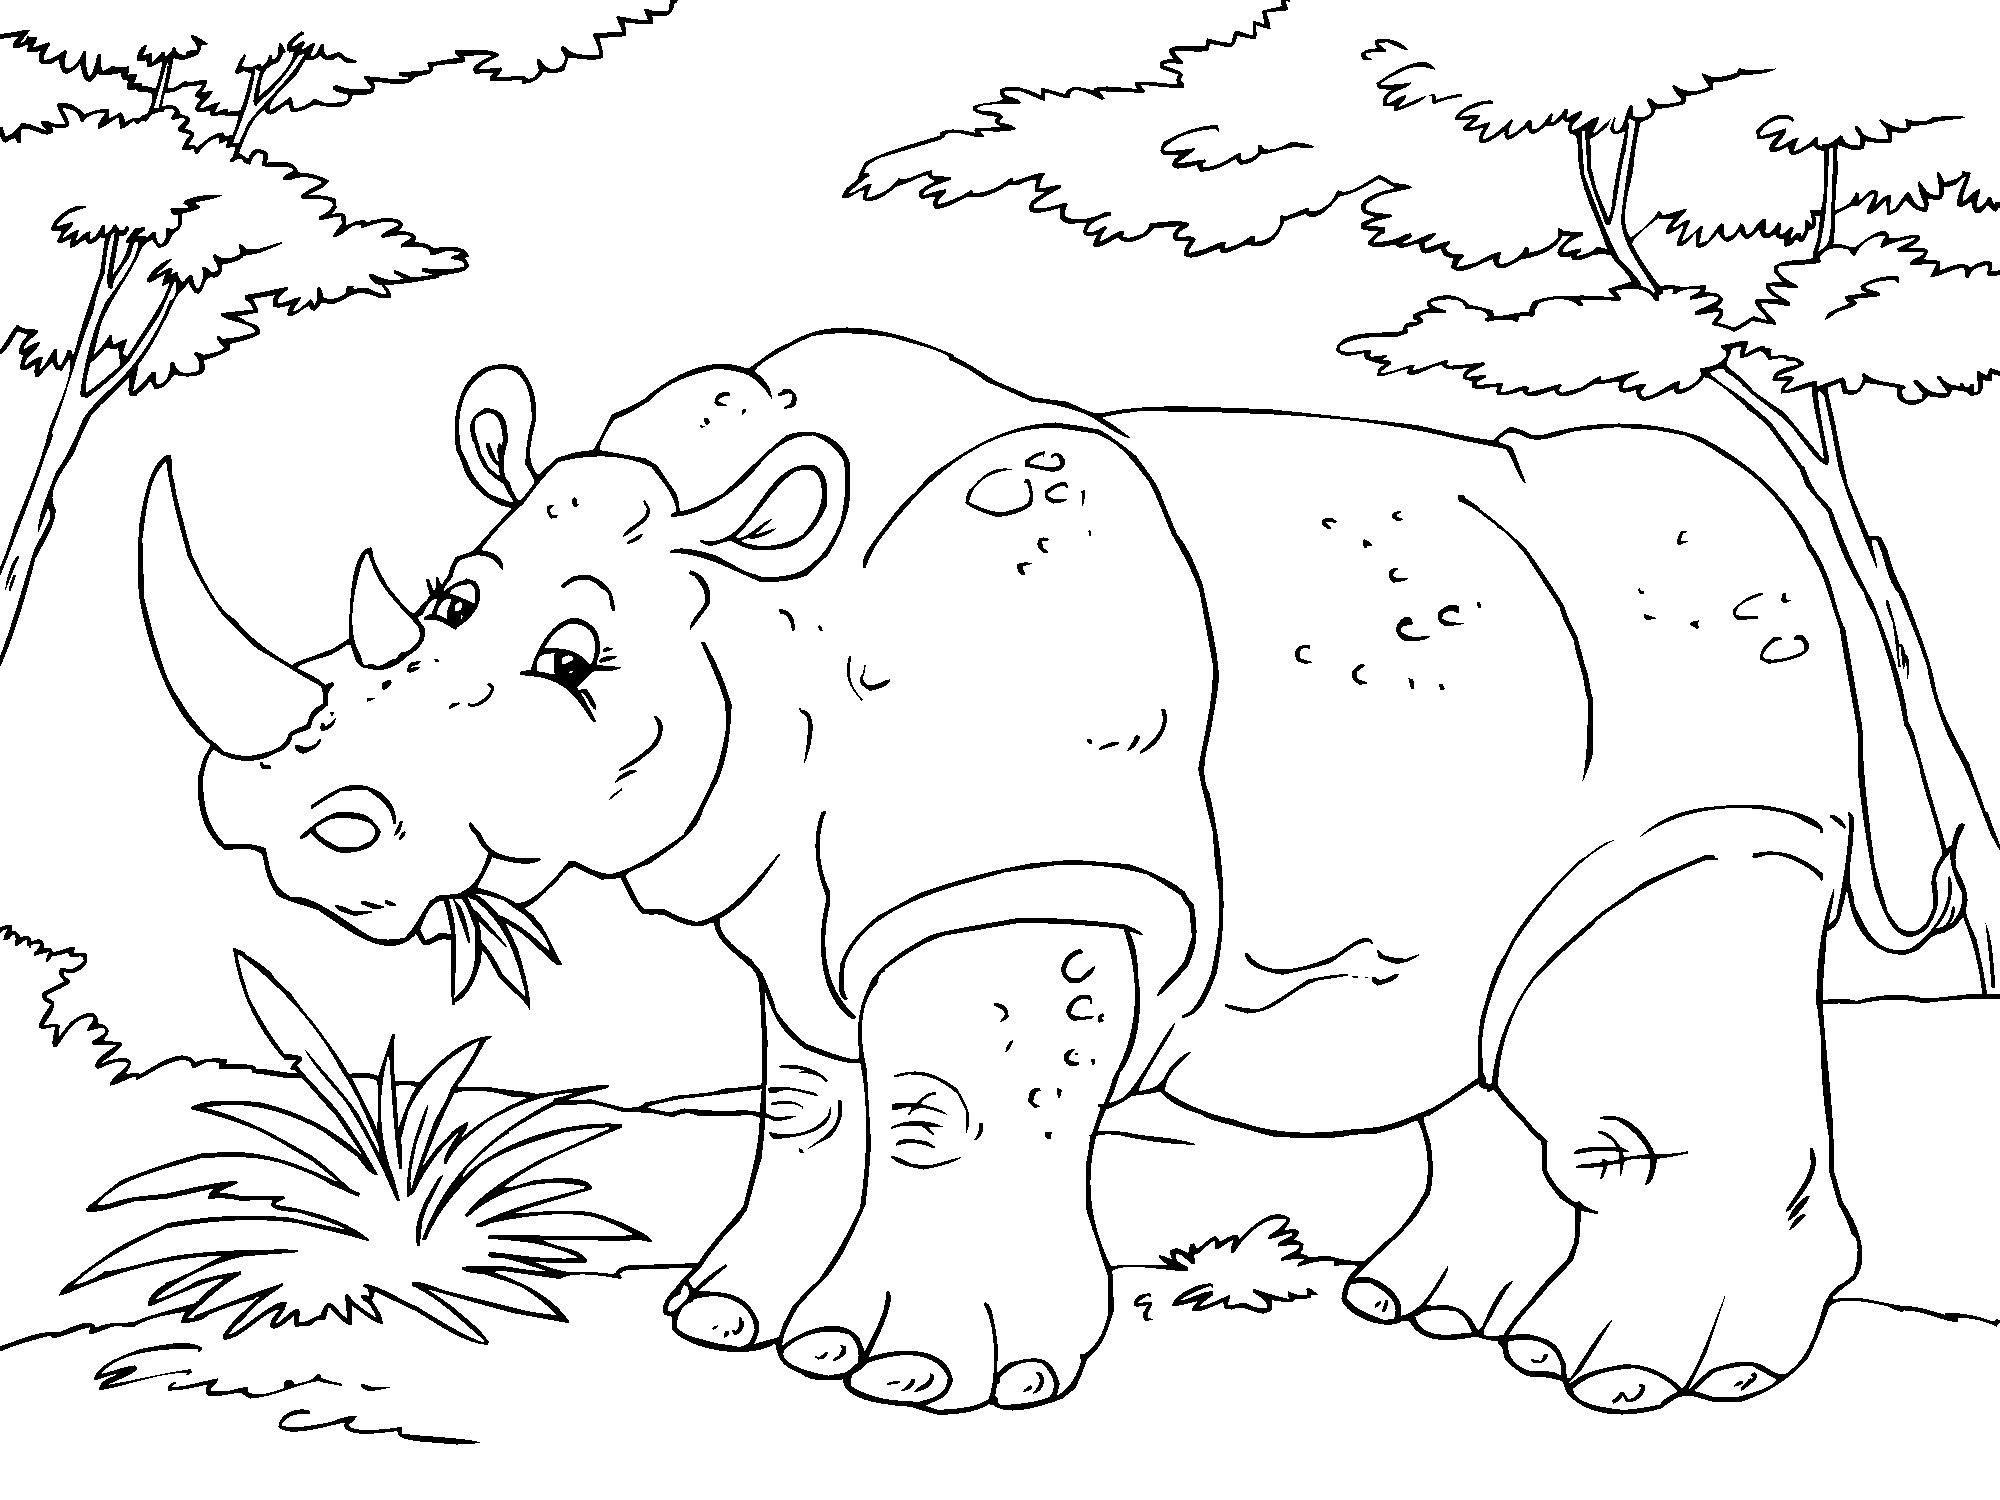 Kleurplaten Dieren In De Zoo Disegno Da Colorare Rinoceronte Cat 23016 Images